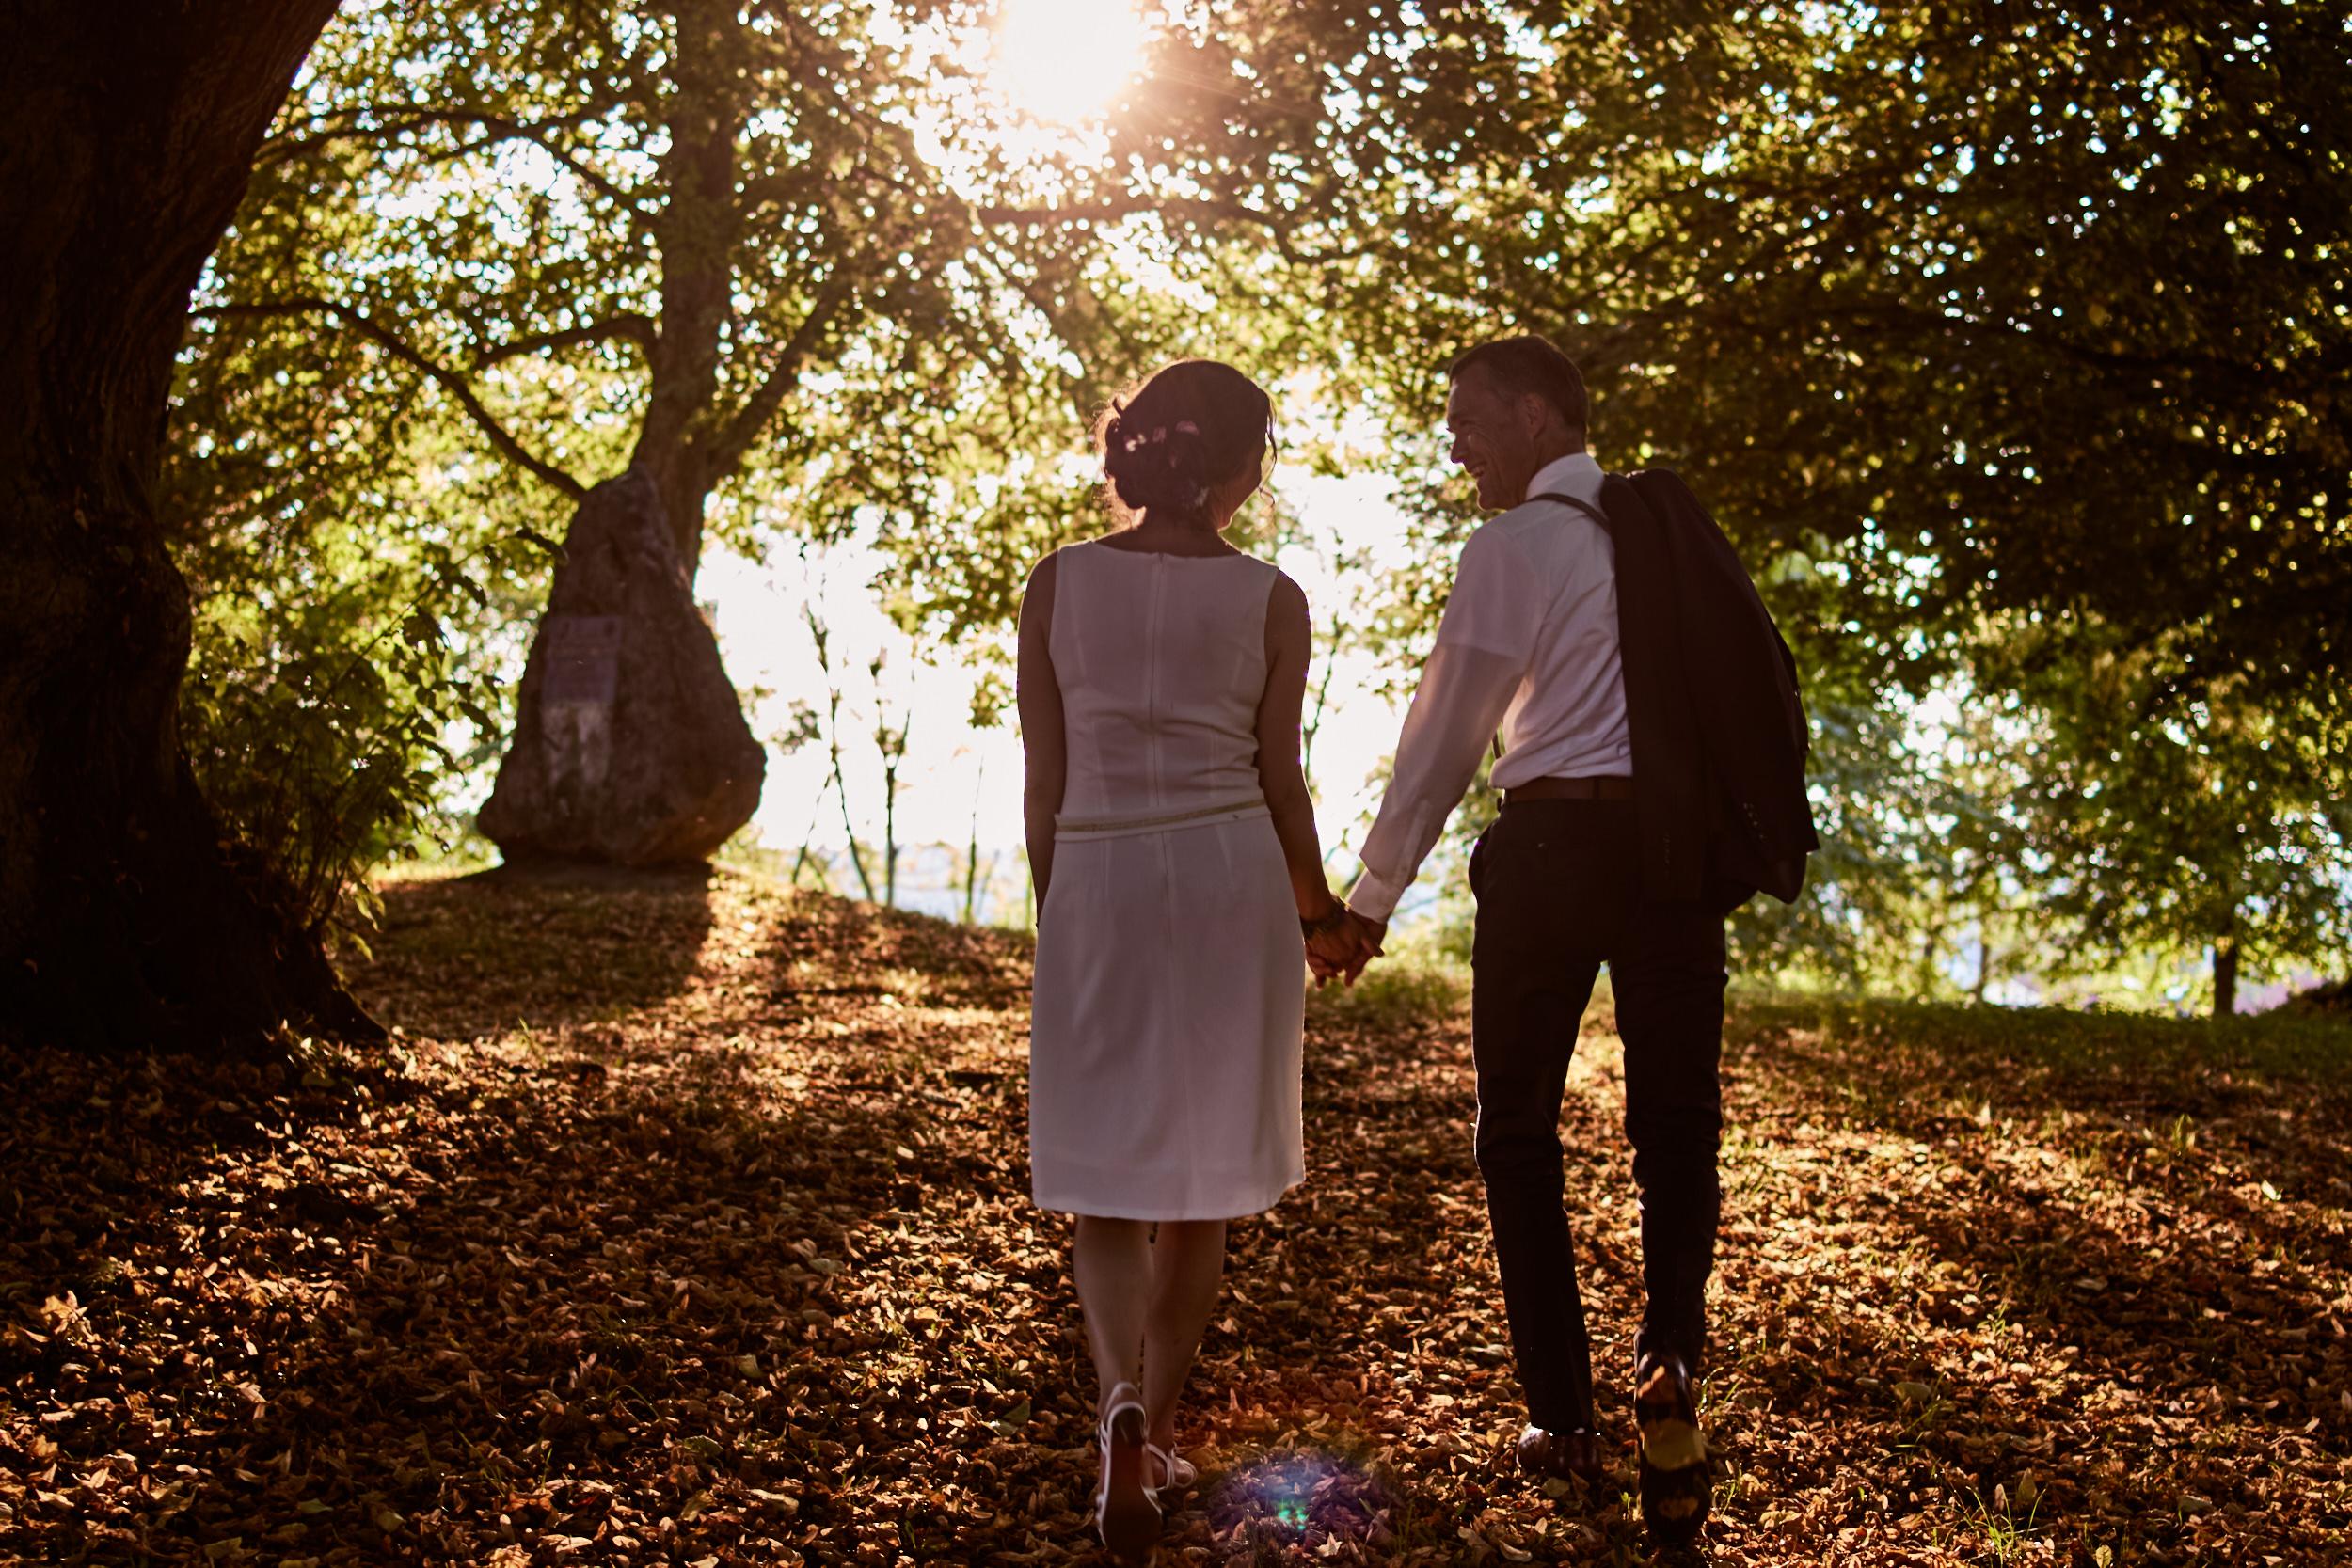 35 mm - 2018-07-27 19.32.06 - Hochzeit Andrea & Jochen Fotoshooting.jpg